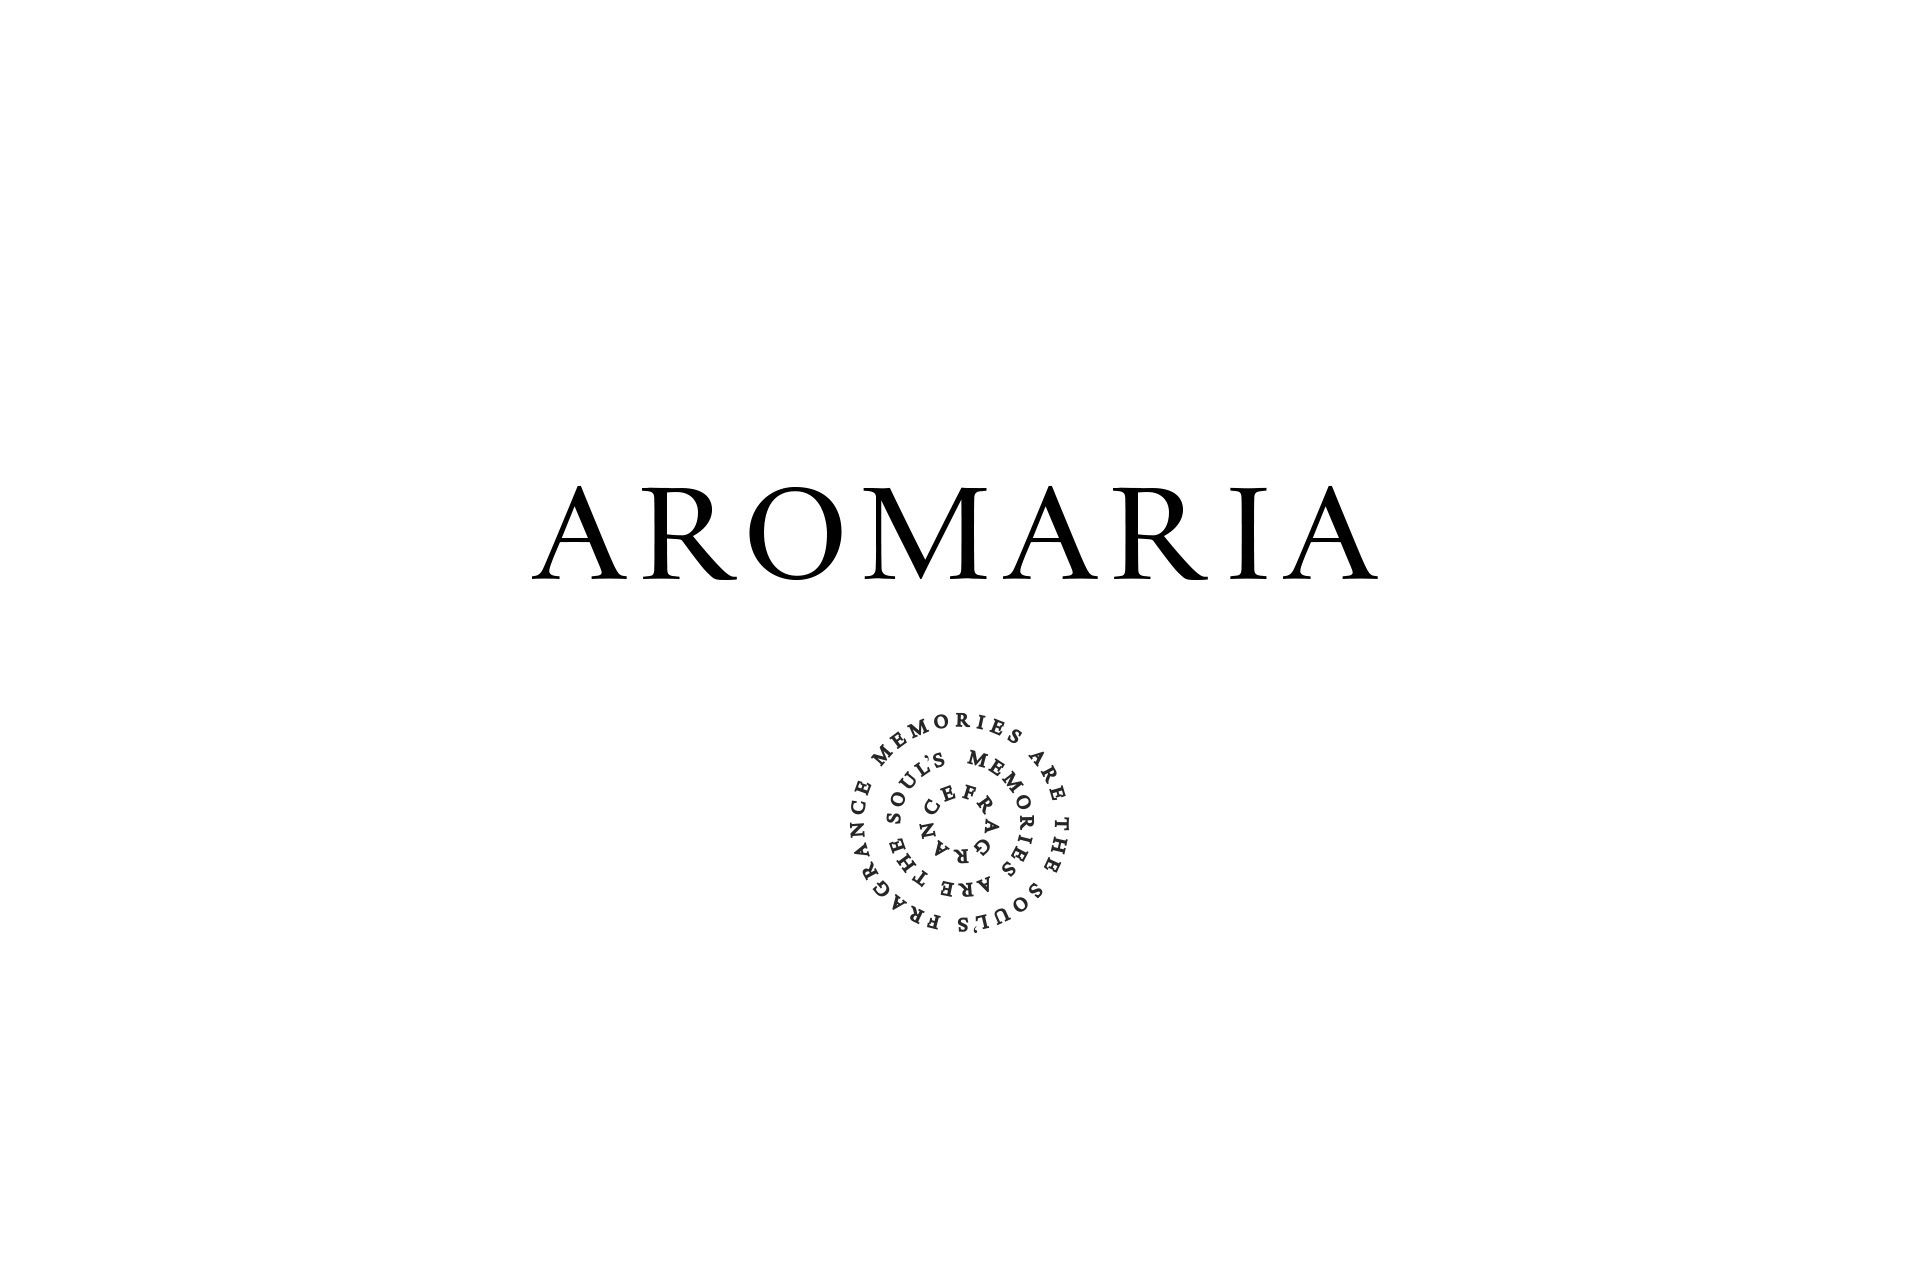 Aromaria-Marca